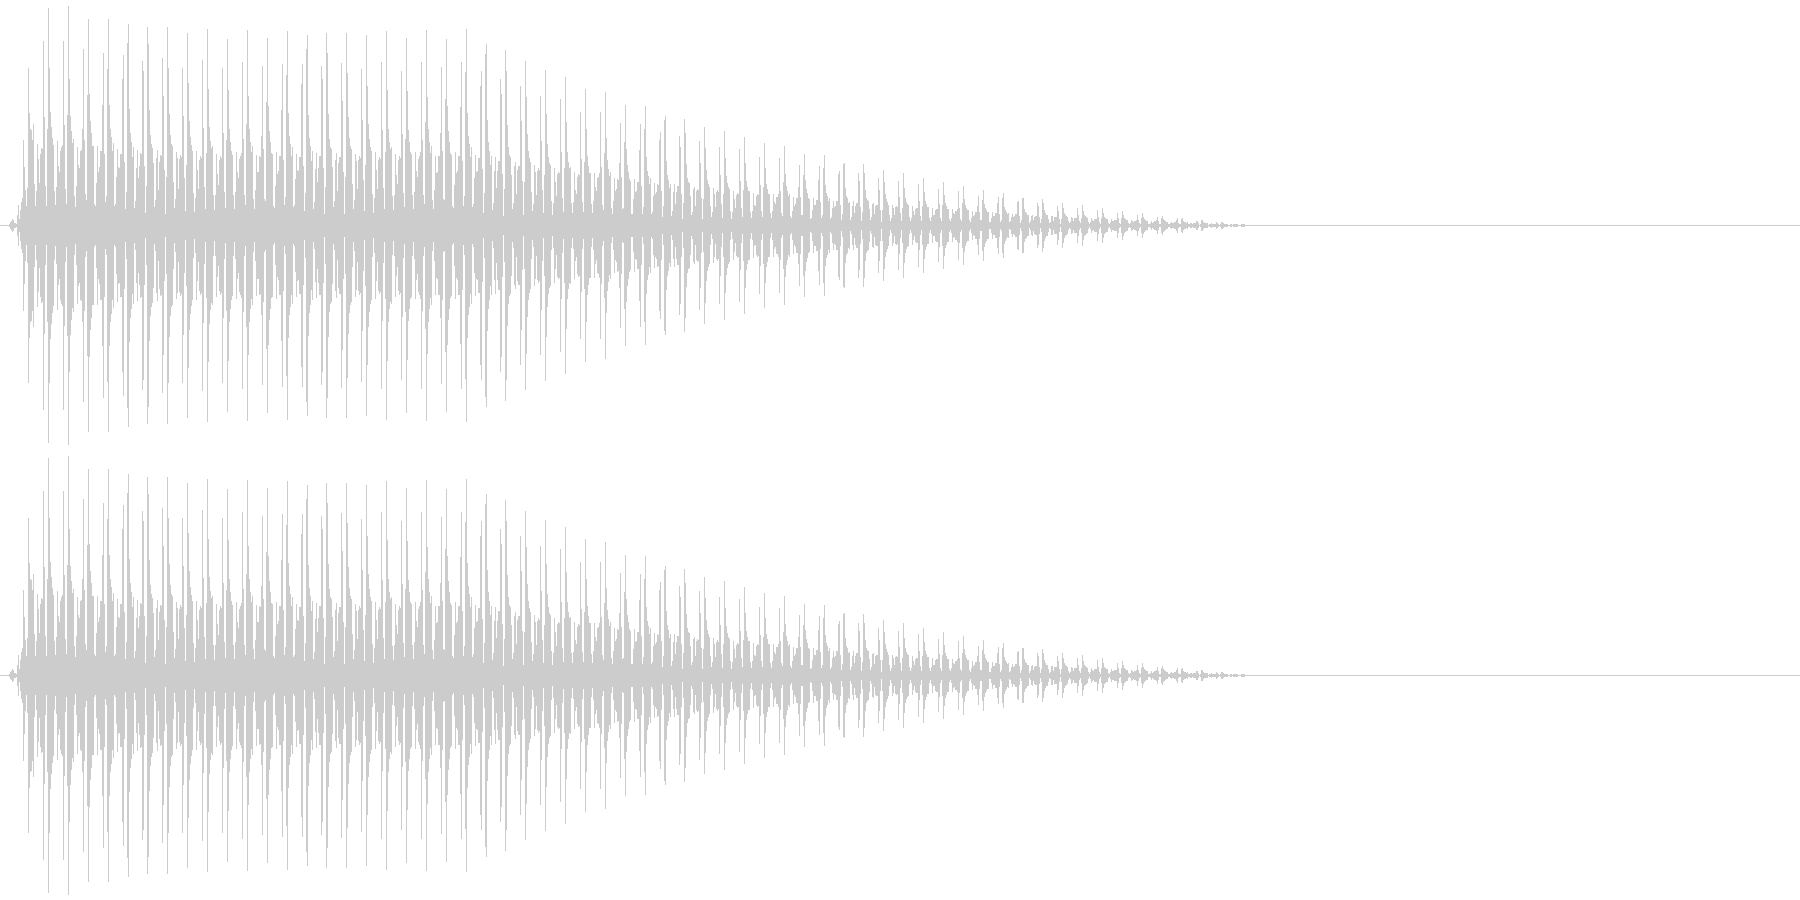 OctaveCom アプリ用タッチ音2の未再生の波形